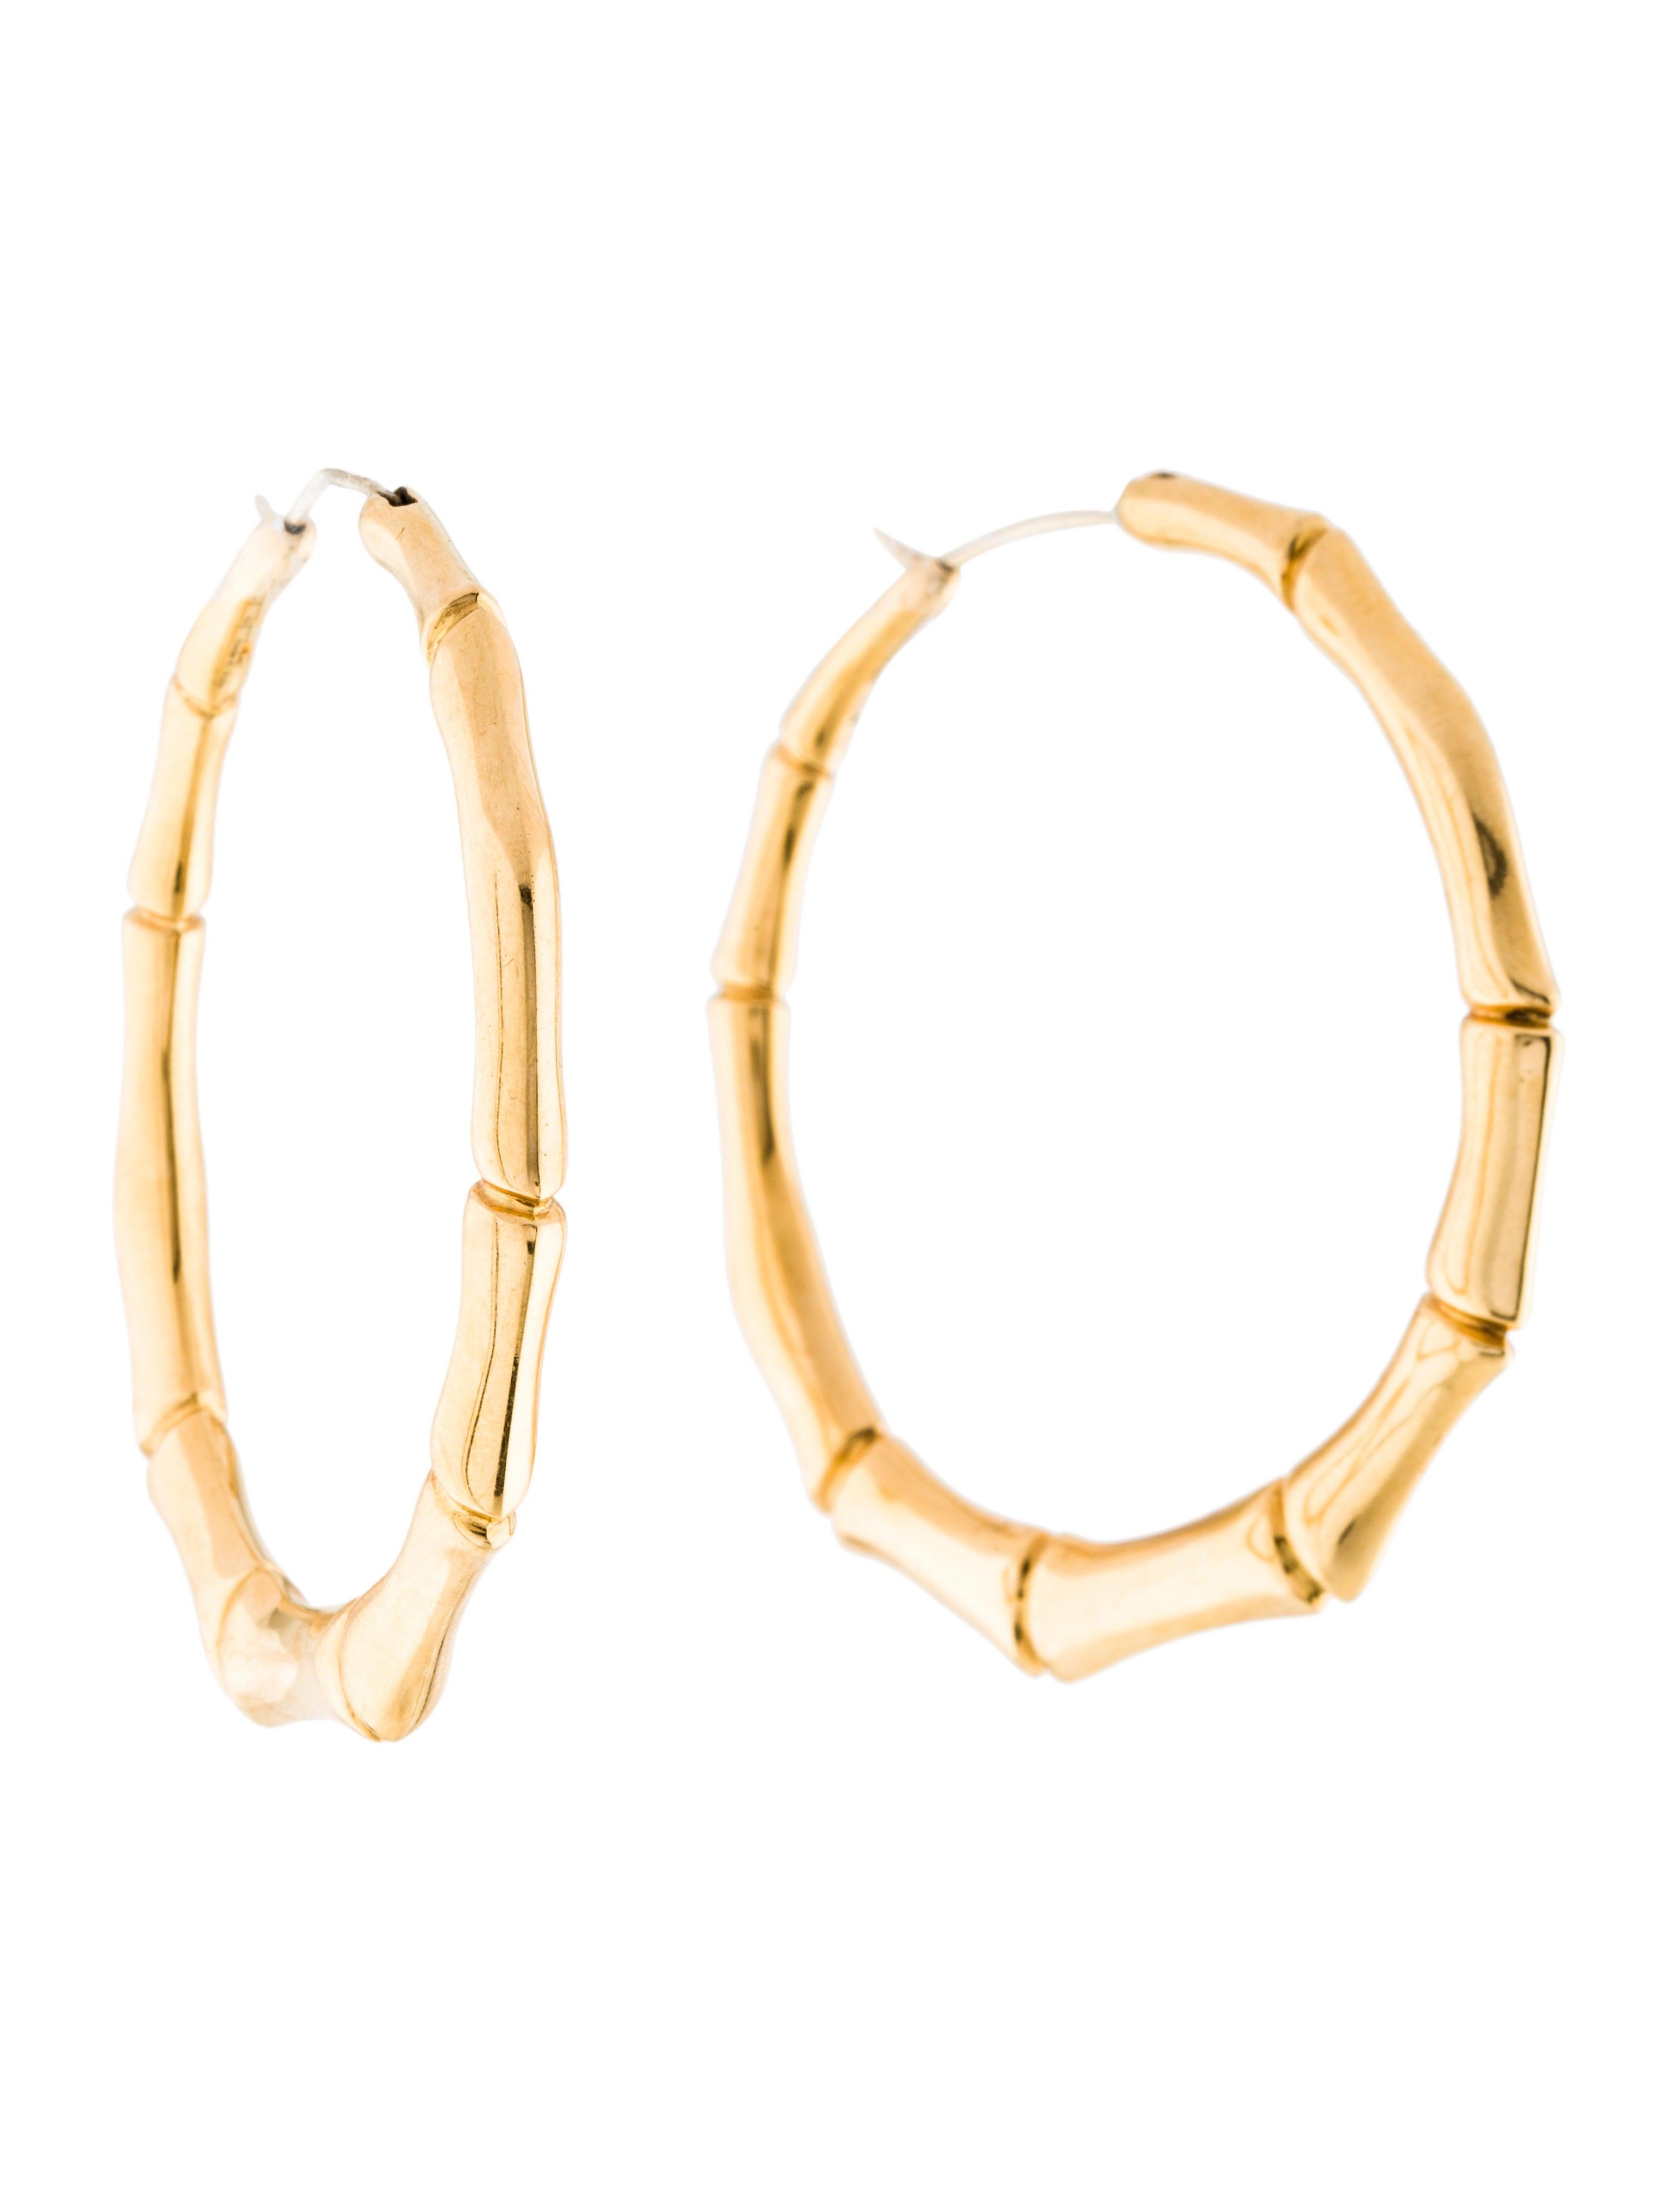 4ef369931 Gucci 18K Bamboo Hoop Earrings - Earrings - GUC241404 | The RealReal